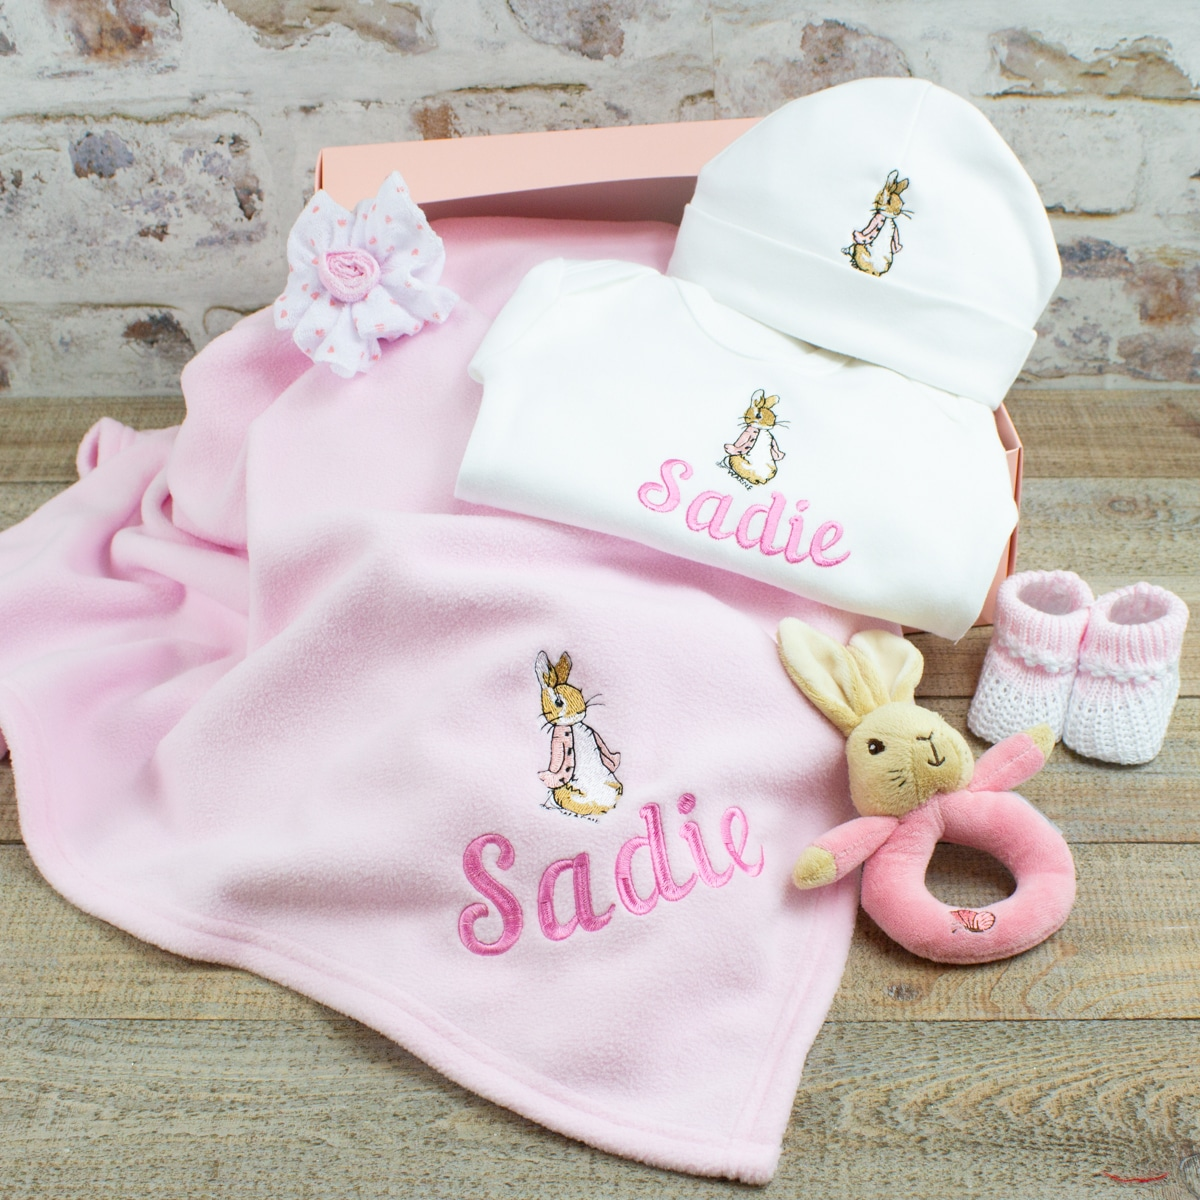 Personalised Peter Rabbit New Baby Gift Hamper